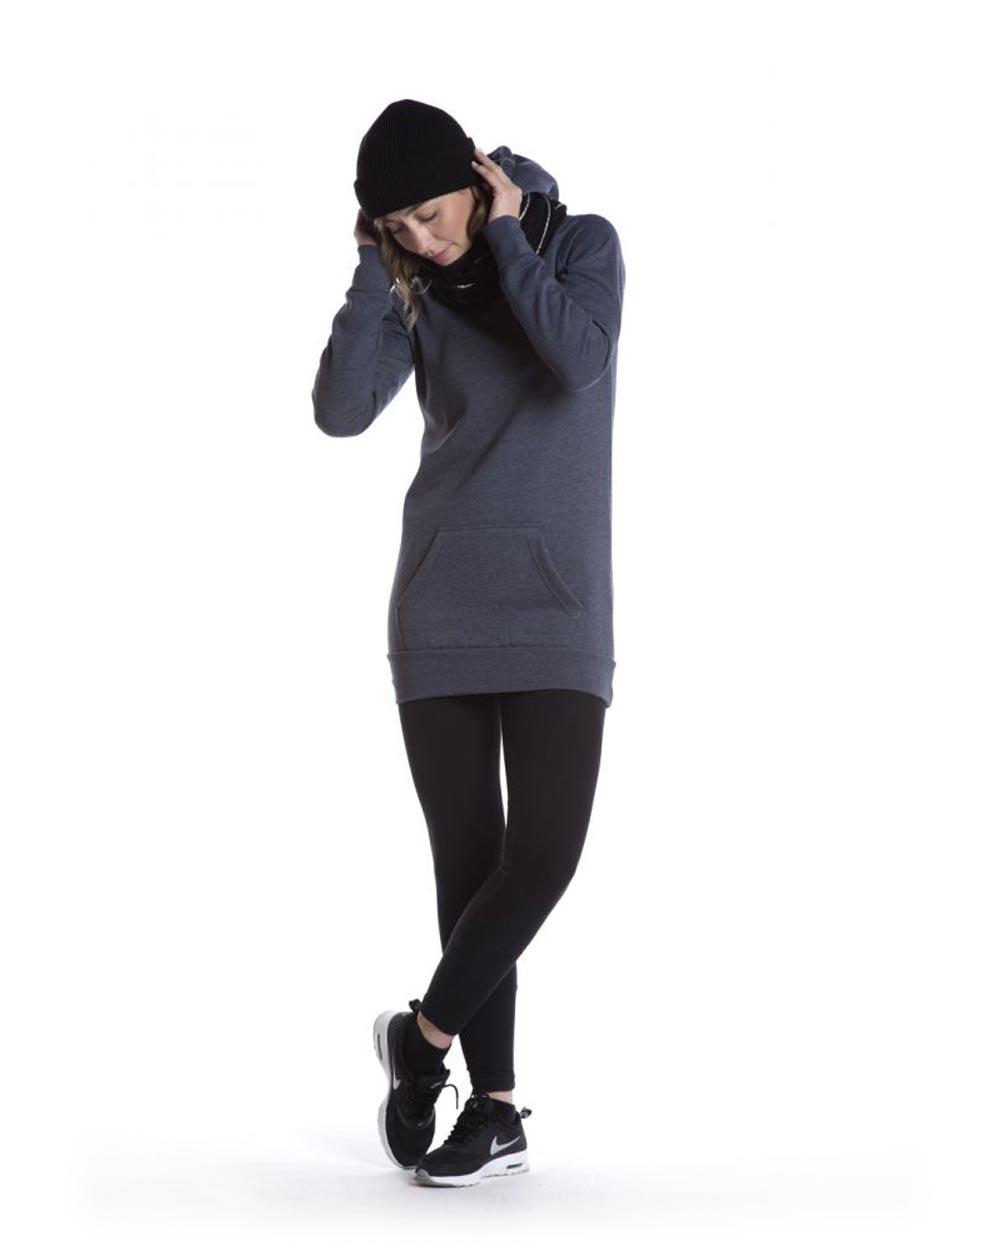 HS Apparel Women's Long Pullover Hooded Sweatshirt